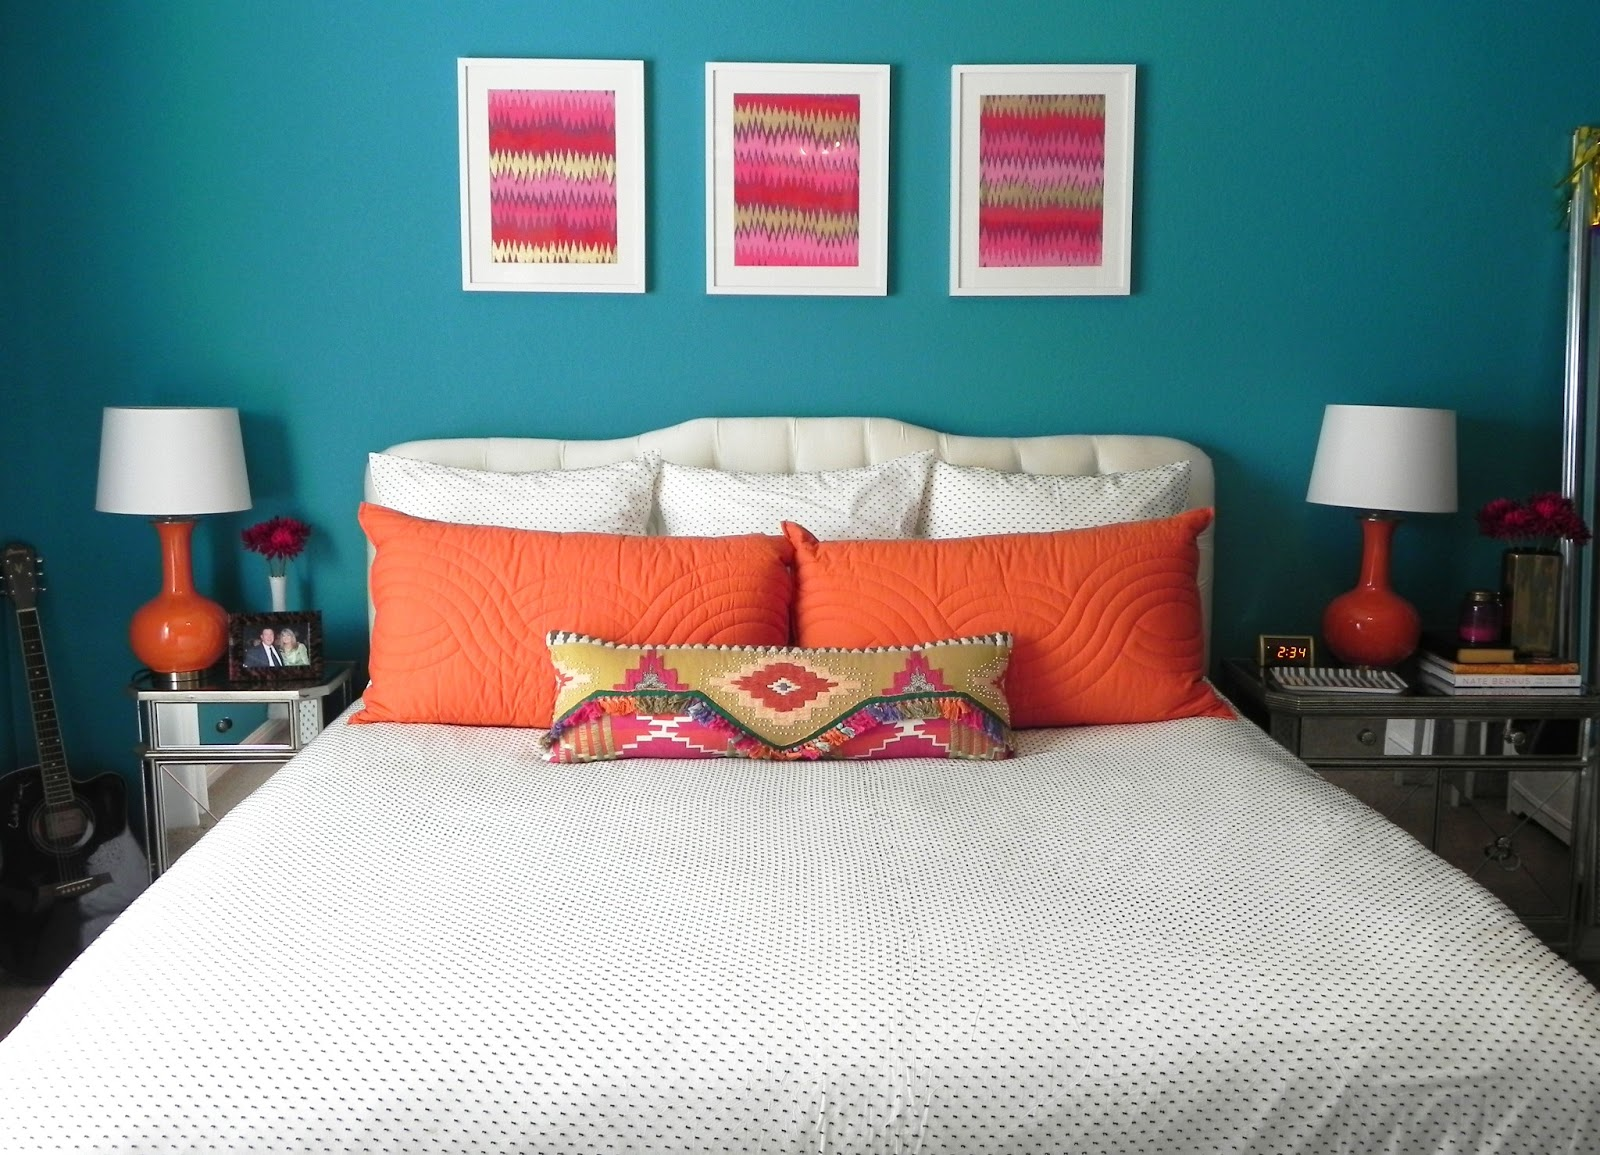 Burnt Orange Wall Paint Dining Room Contemporary With Aqua: Spray Paint & Chardonnay